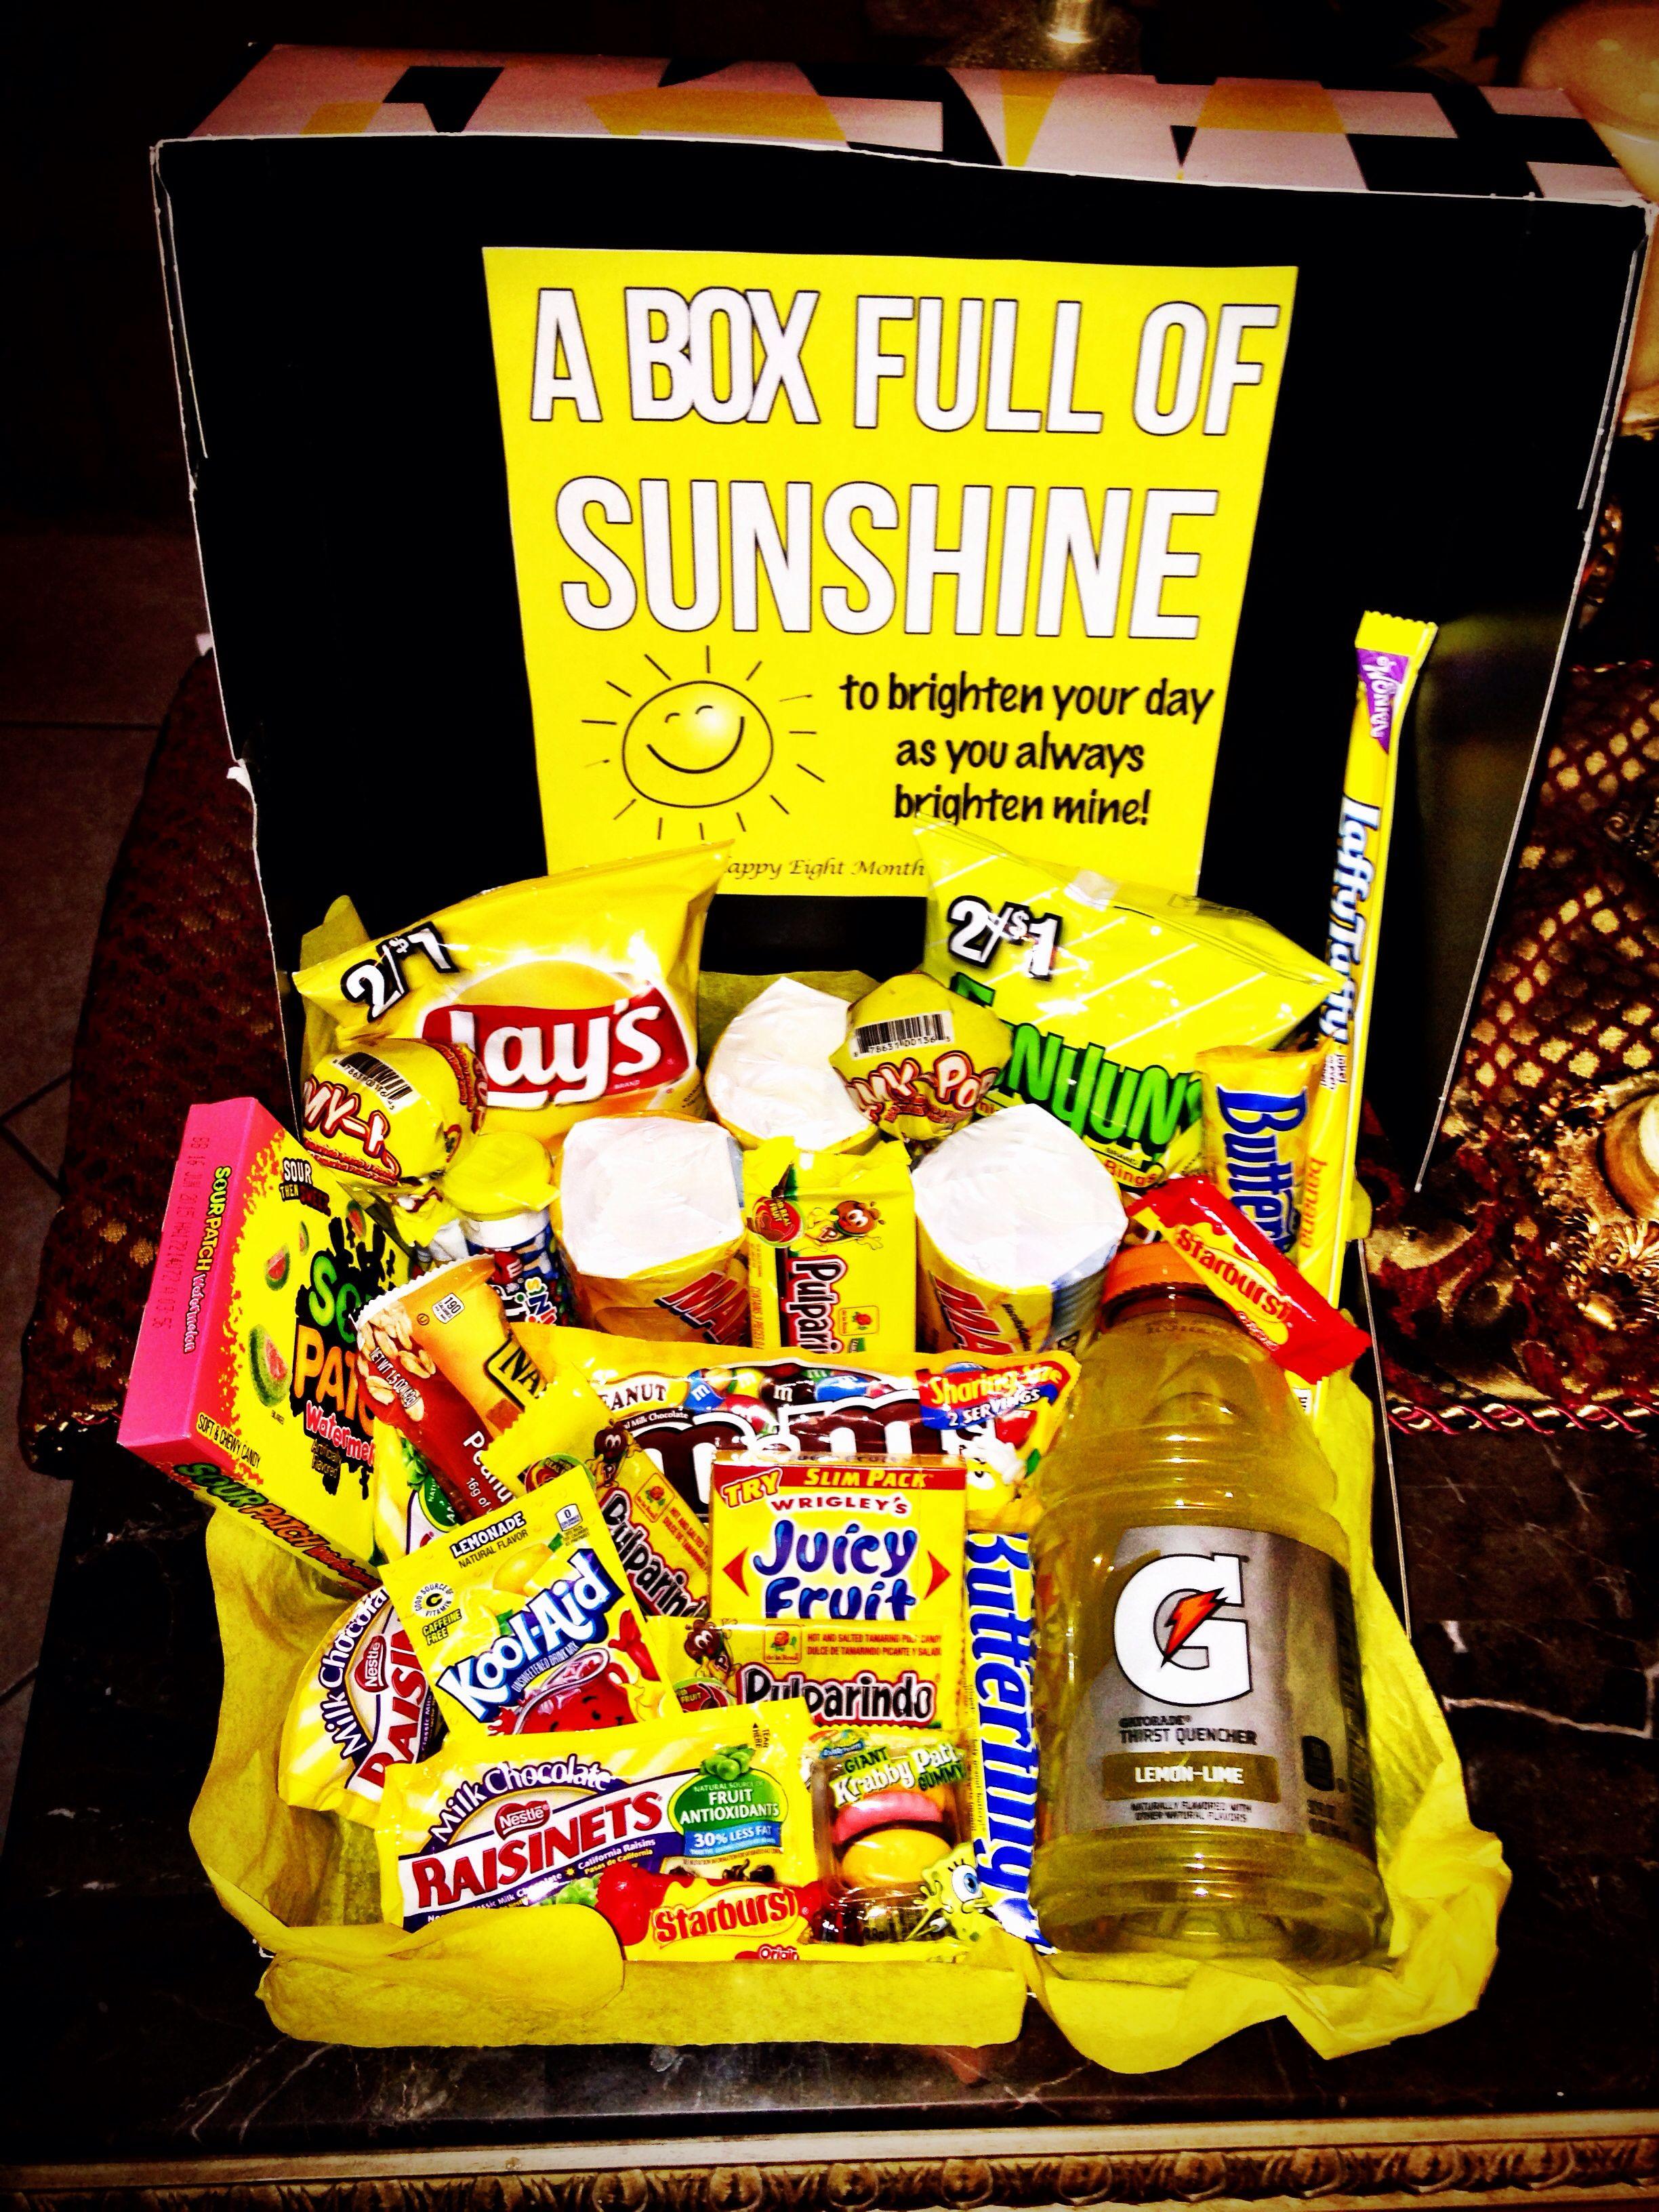 Box Full Of Sunshine